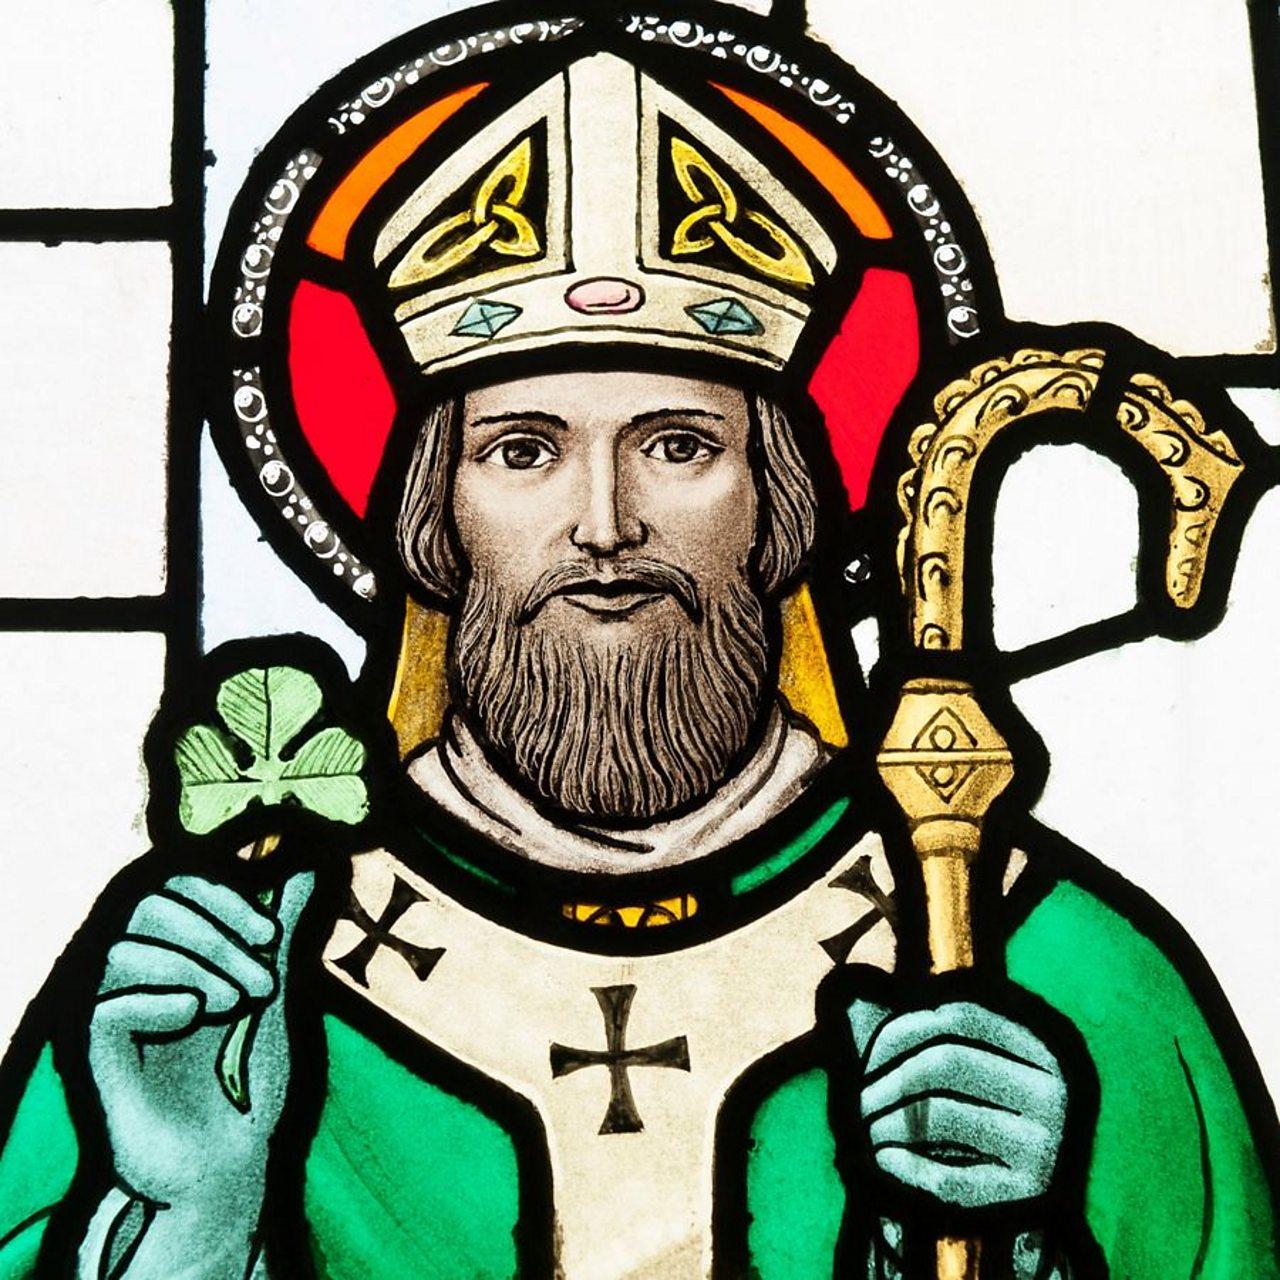 Image of Saint Patrick